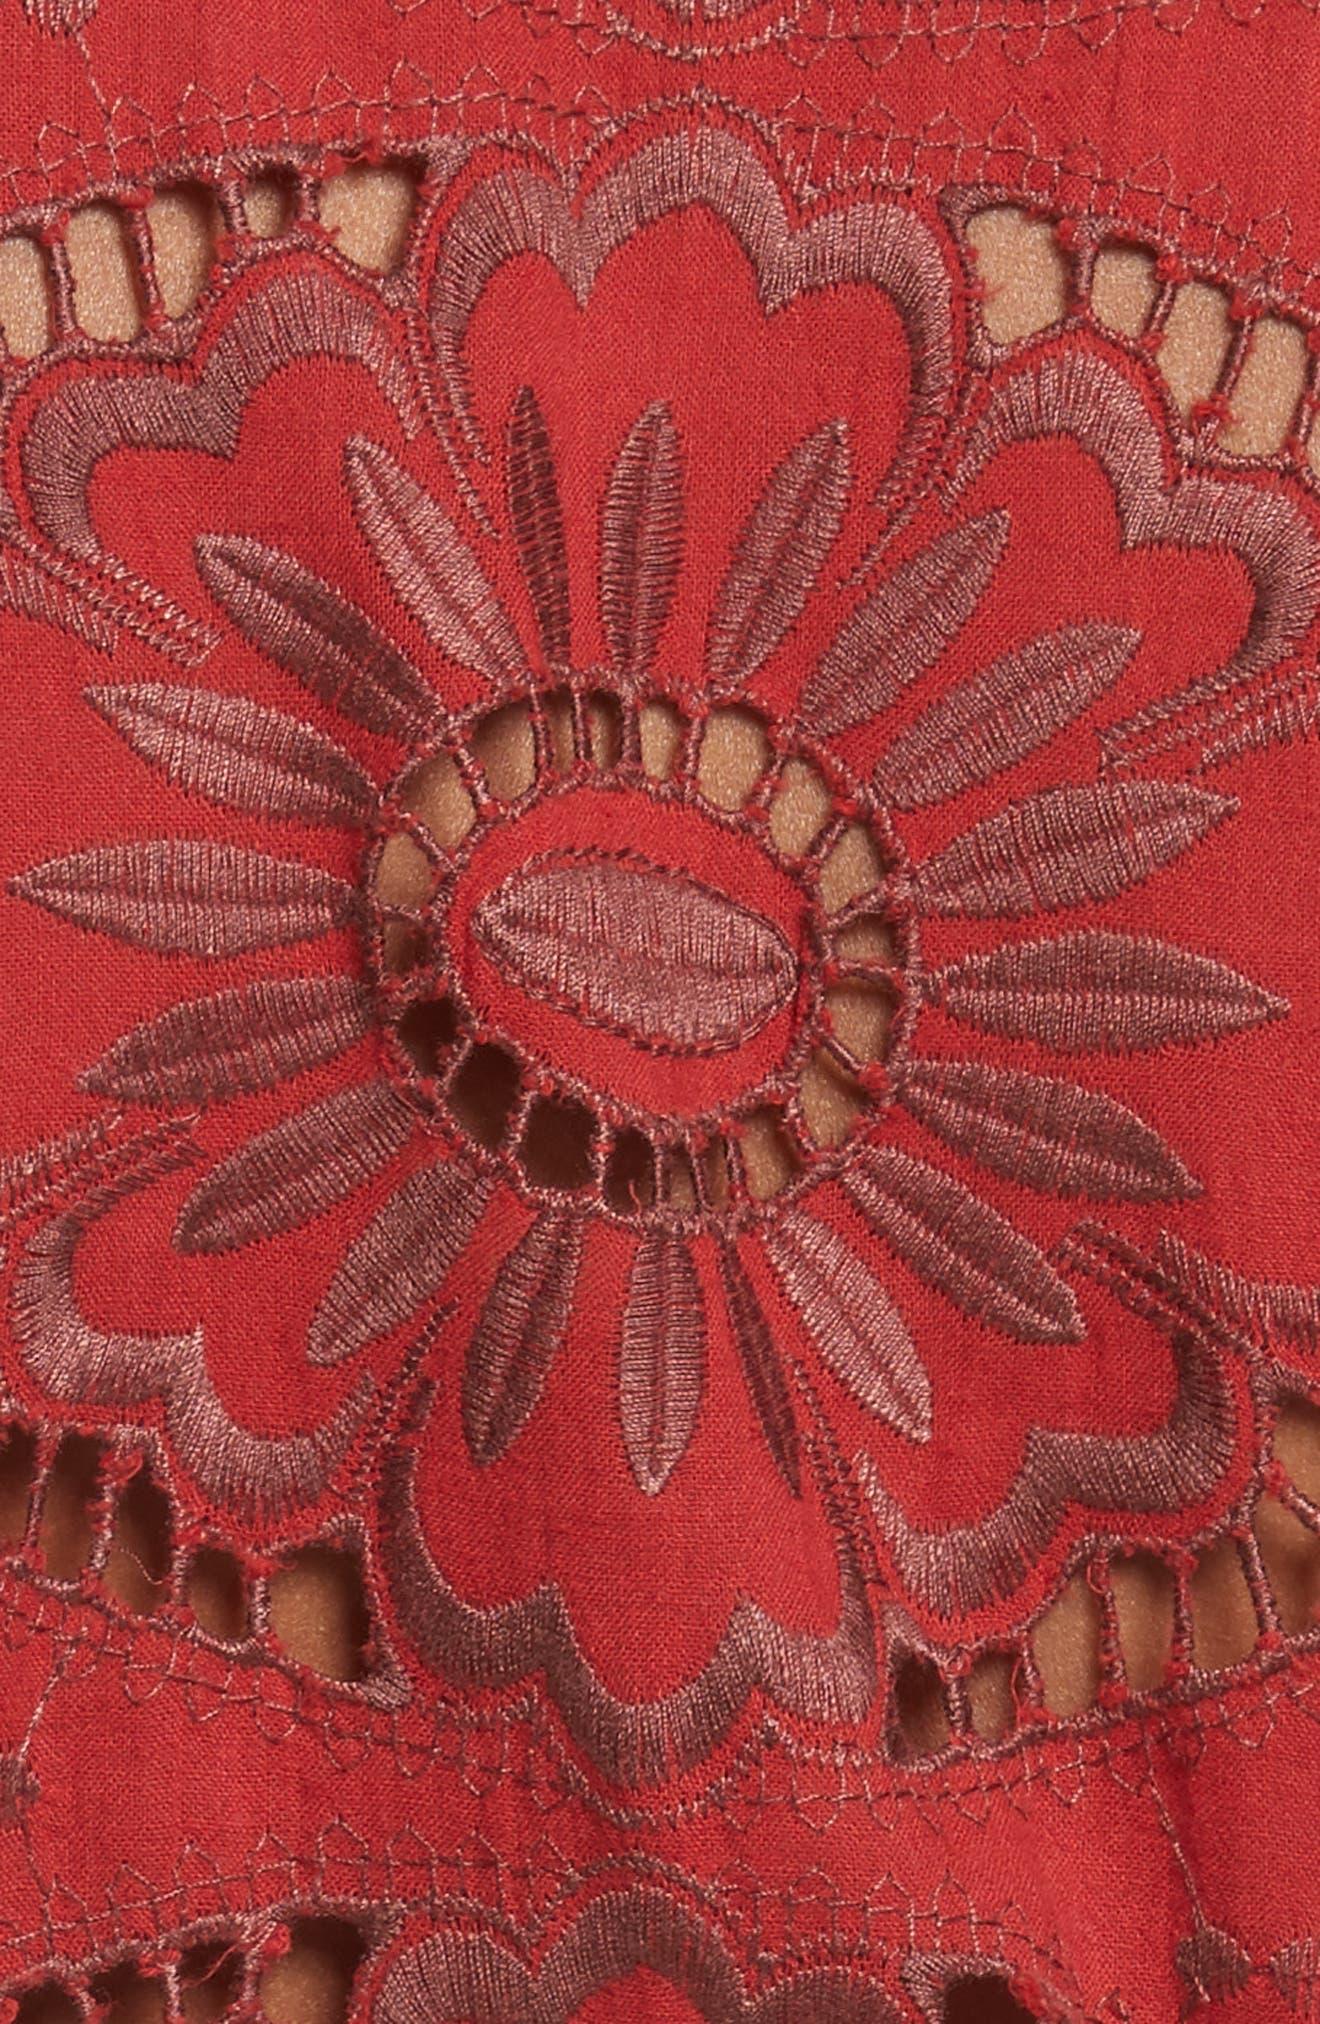 Ruffle Cotton Eyelet Dress,                             Alternate thumbnail 5, color,                             Brick/ Dark Brick